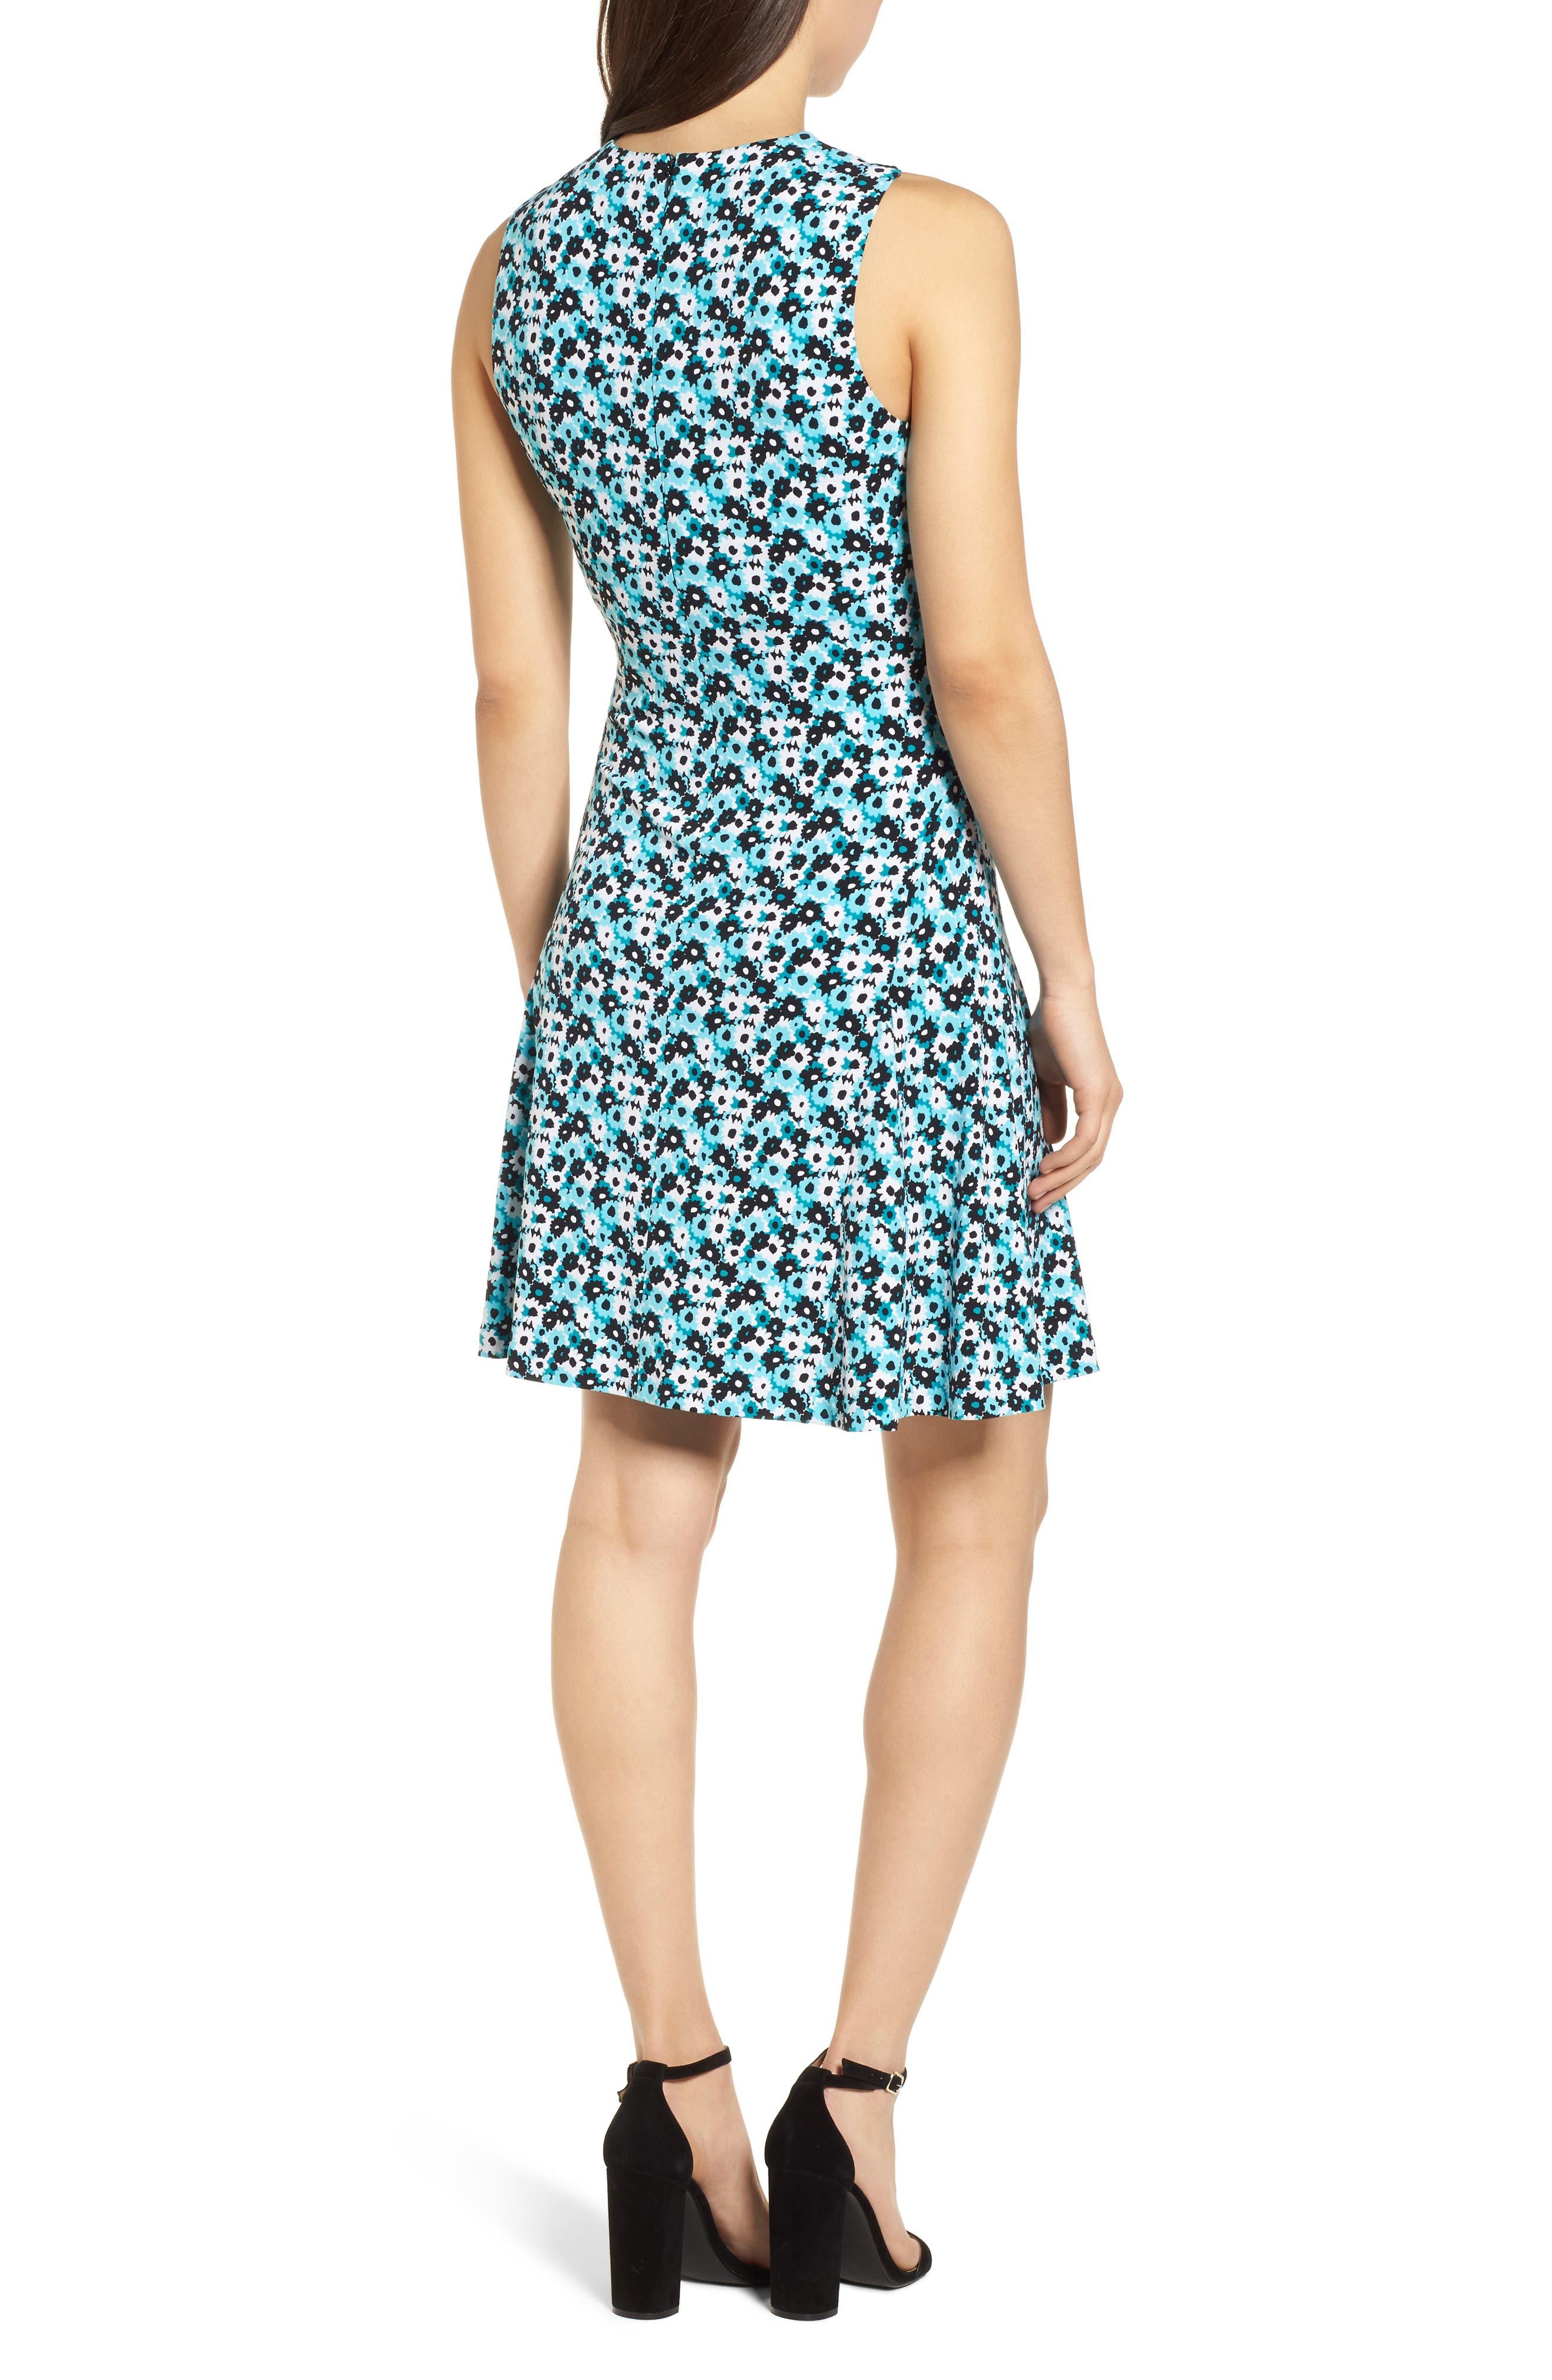 Carnations Cross Neck Fit and Flare Dress,                             Alternate thumbnail 2, color,                             Tile Blue/ Black Multi